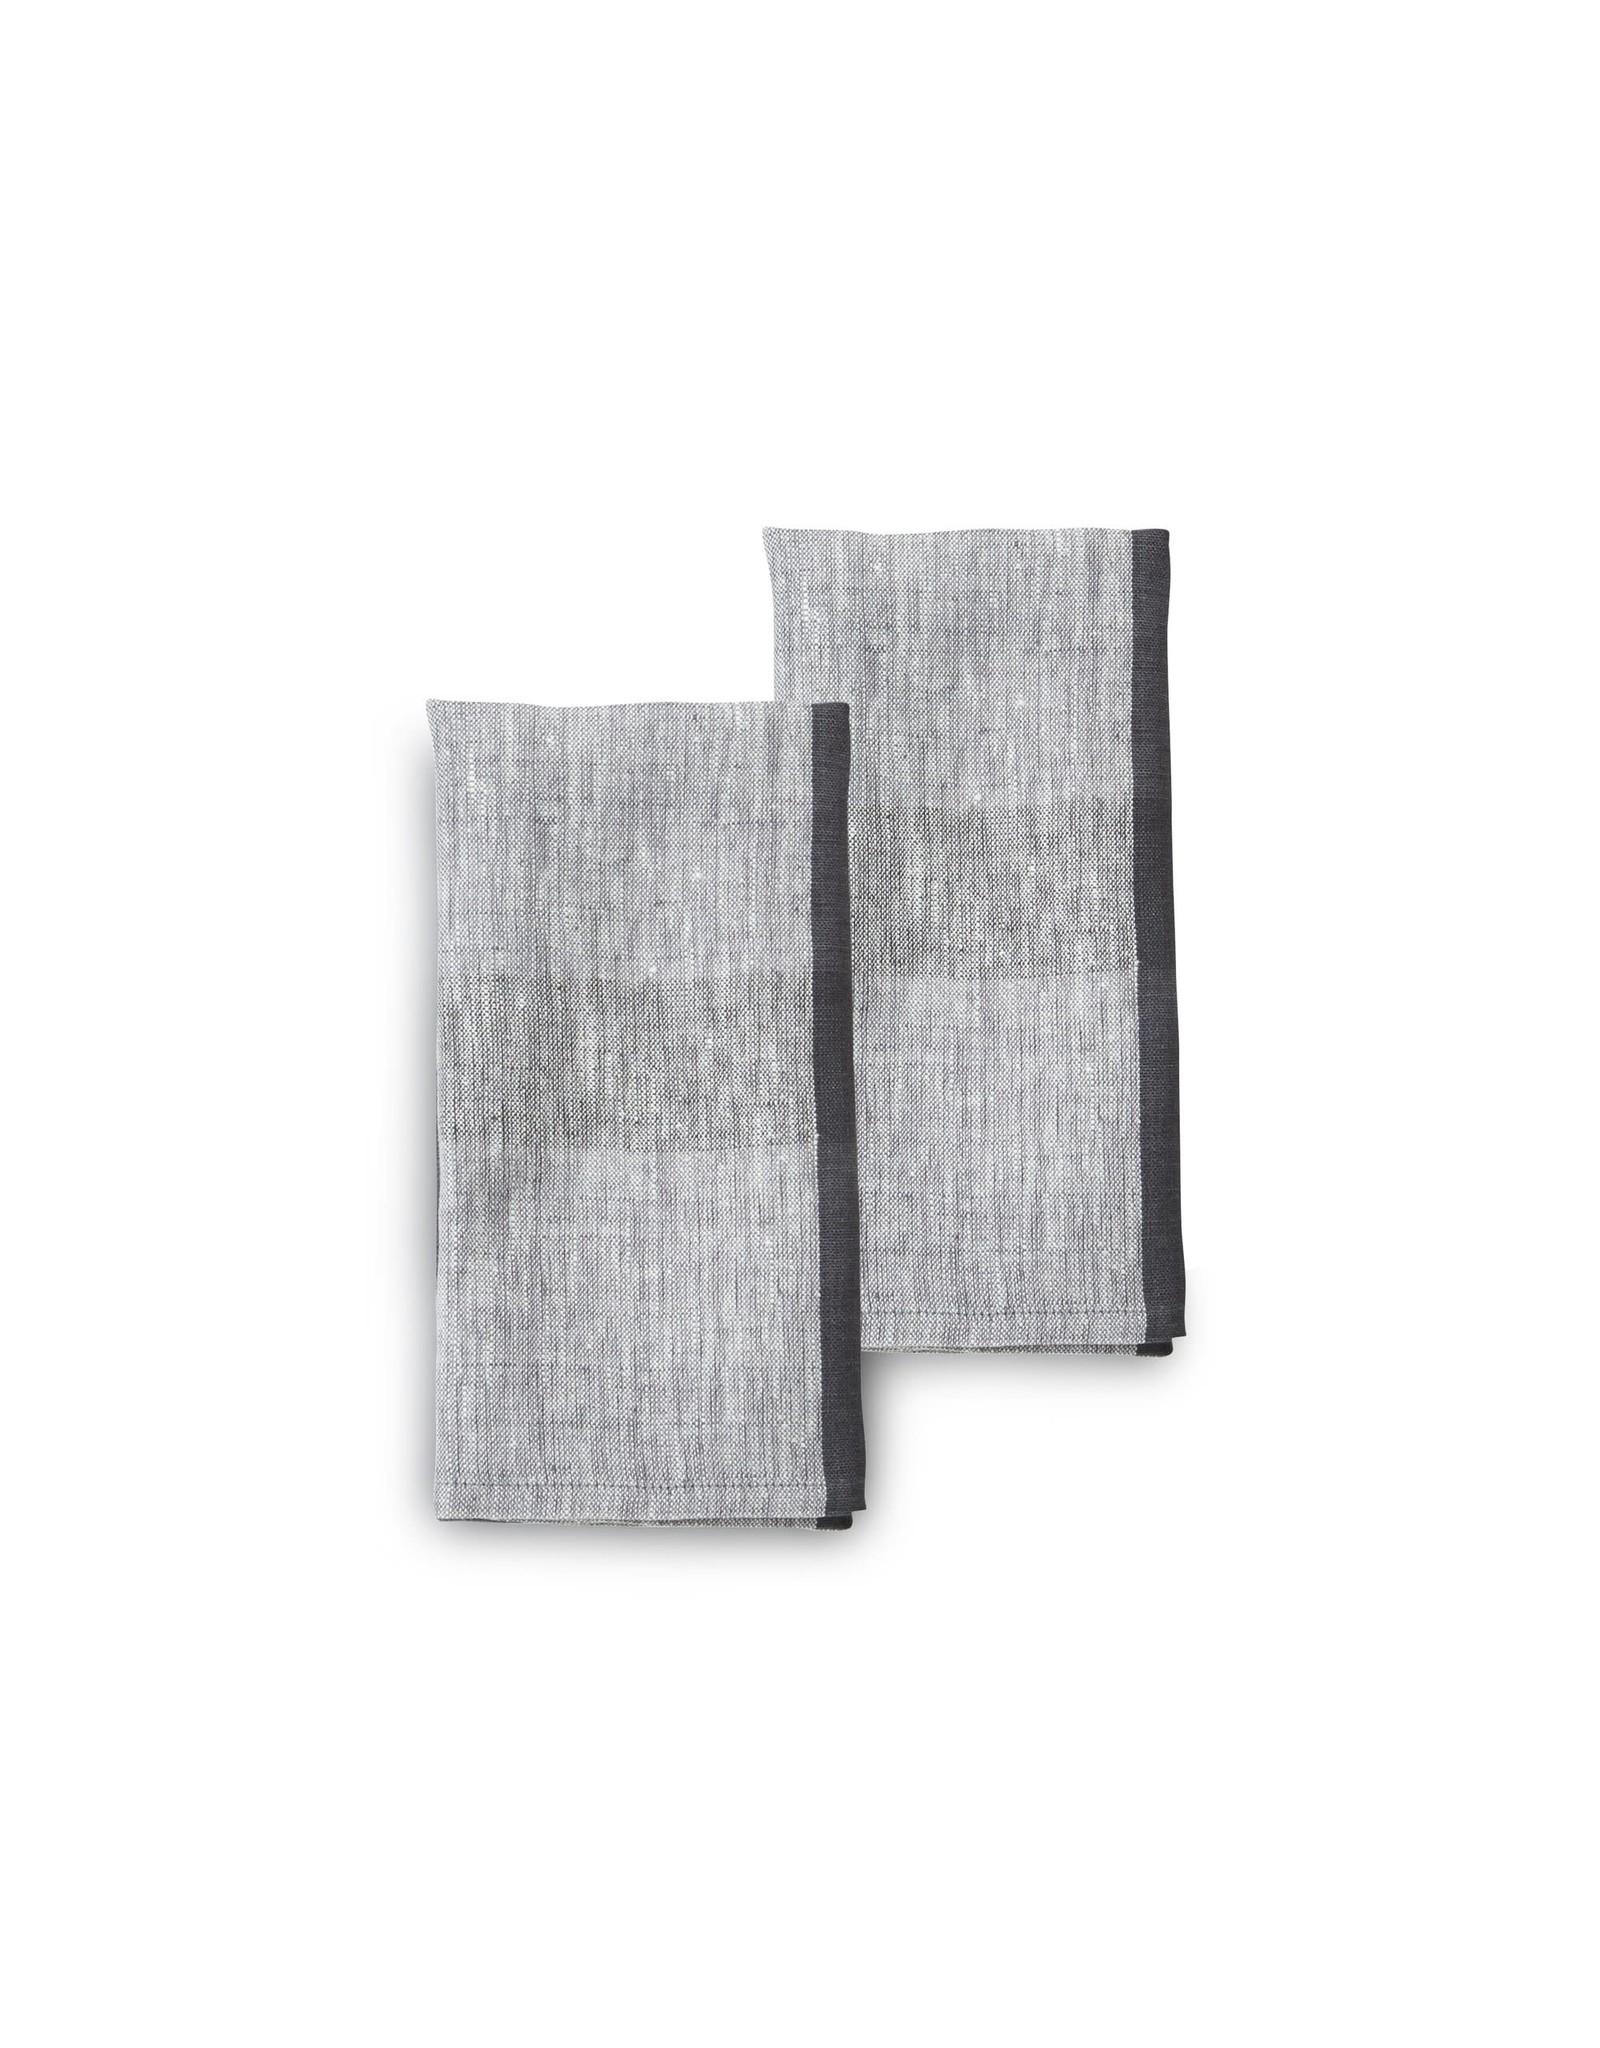 20 x 20  Linen Napkins, Set of 2, High Tea, India